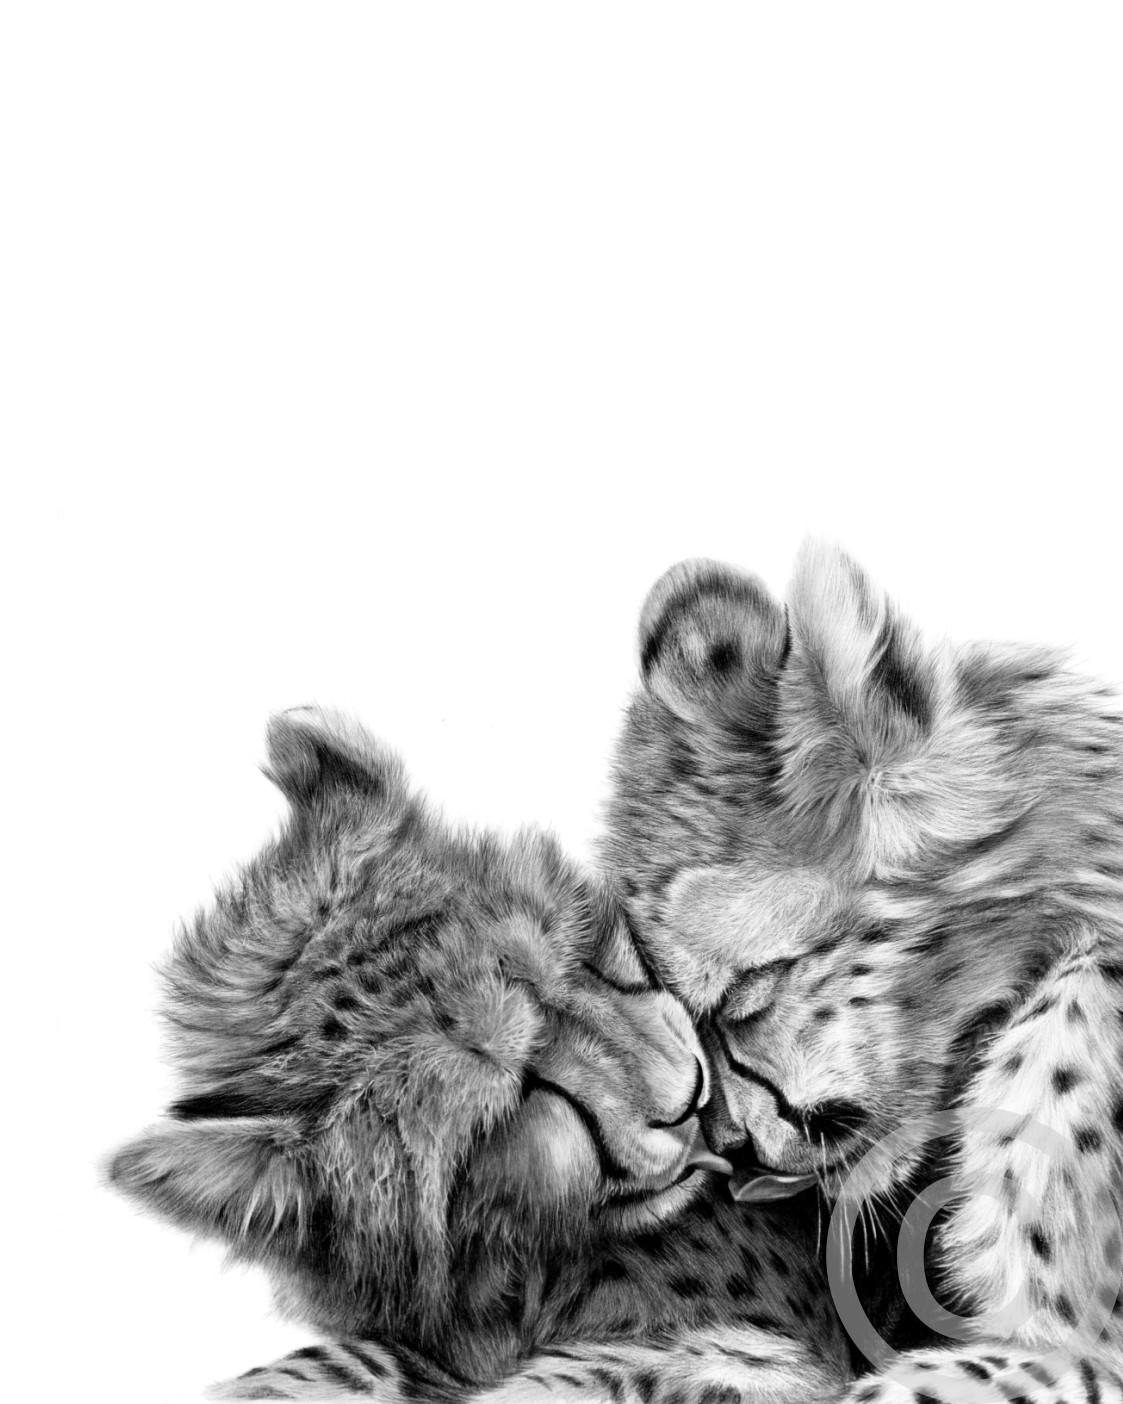 """Lean on Me"" 425mm x 595mm original size print on paper"